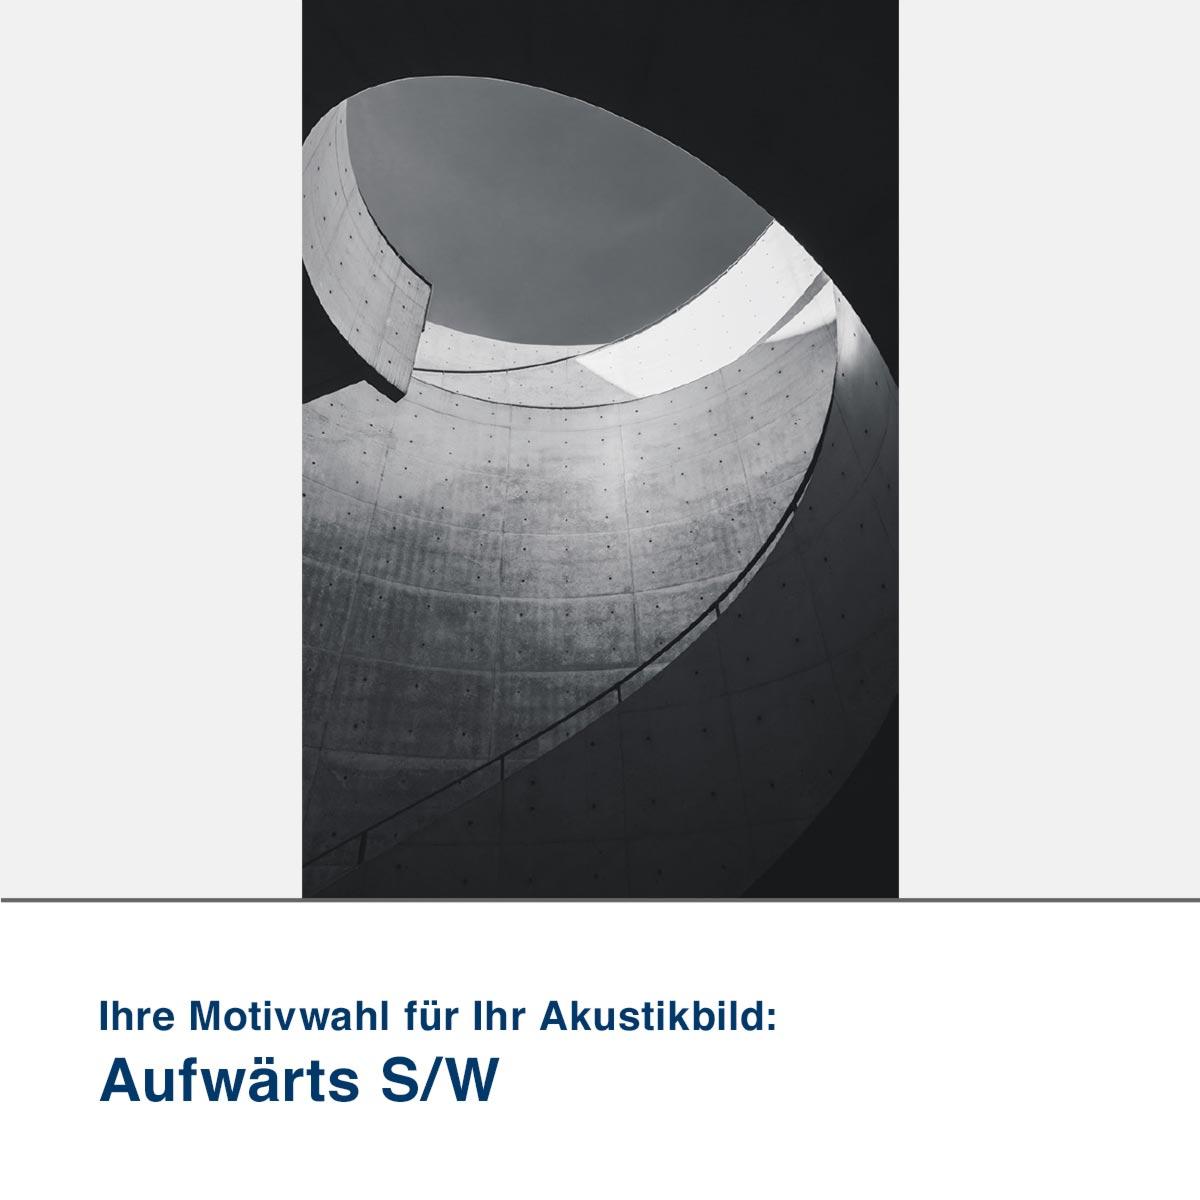 Akustikbild Motiv Aufwärts S/W